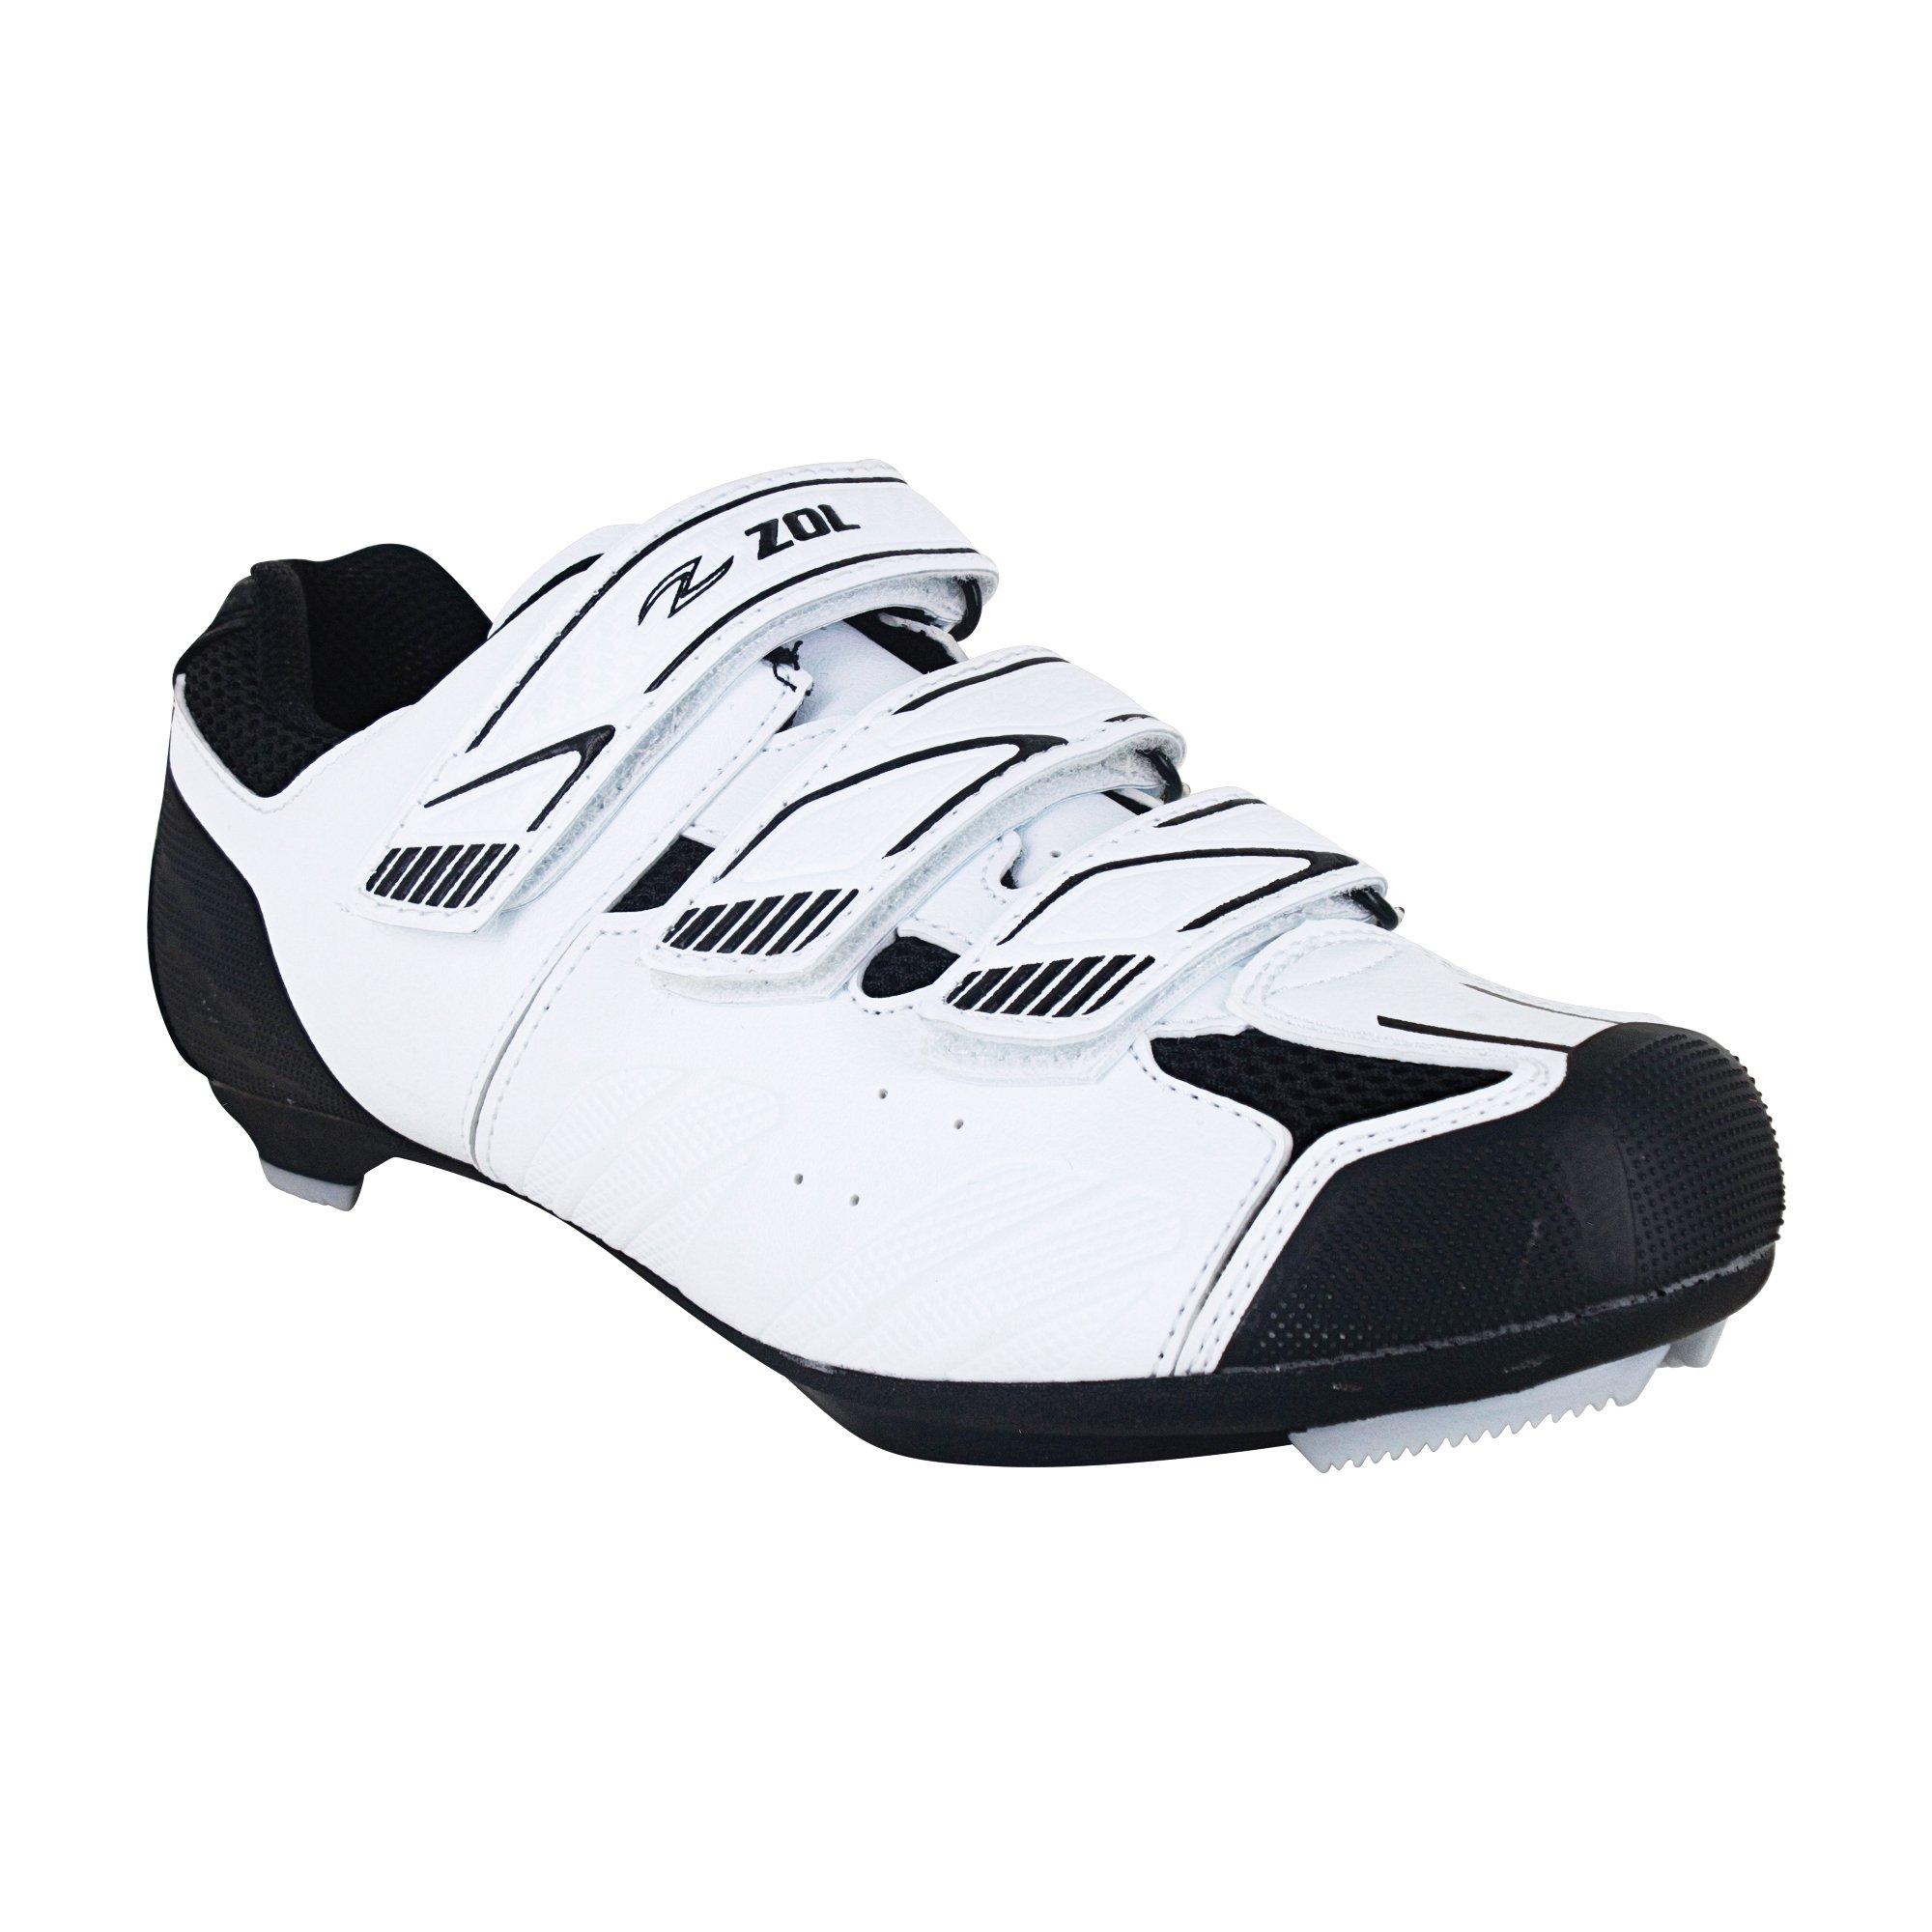 Zapatillas para bicicleta de carretera Zol Stage, 39 CM (EU)/ 7 ...